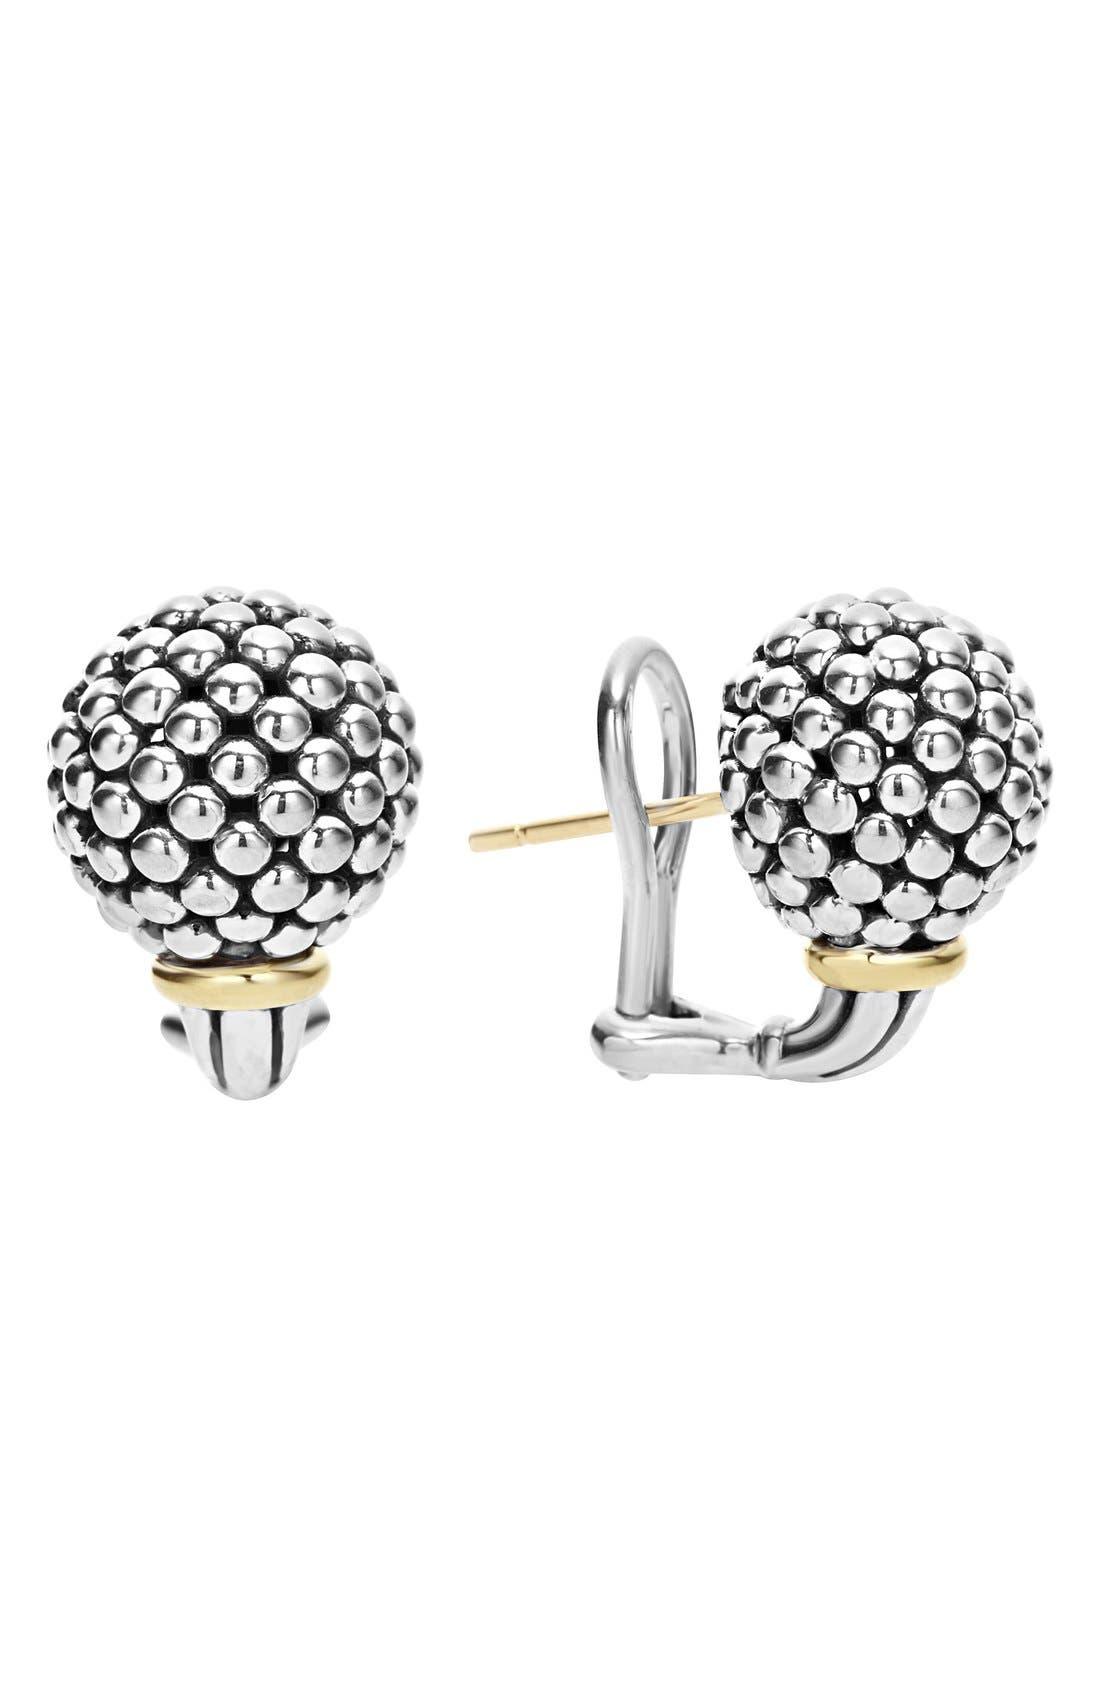 Main Image - LAGOS 'Caviar Forever' Stud Earrings